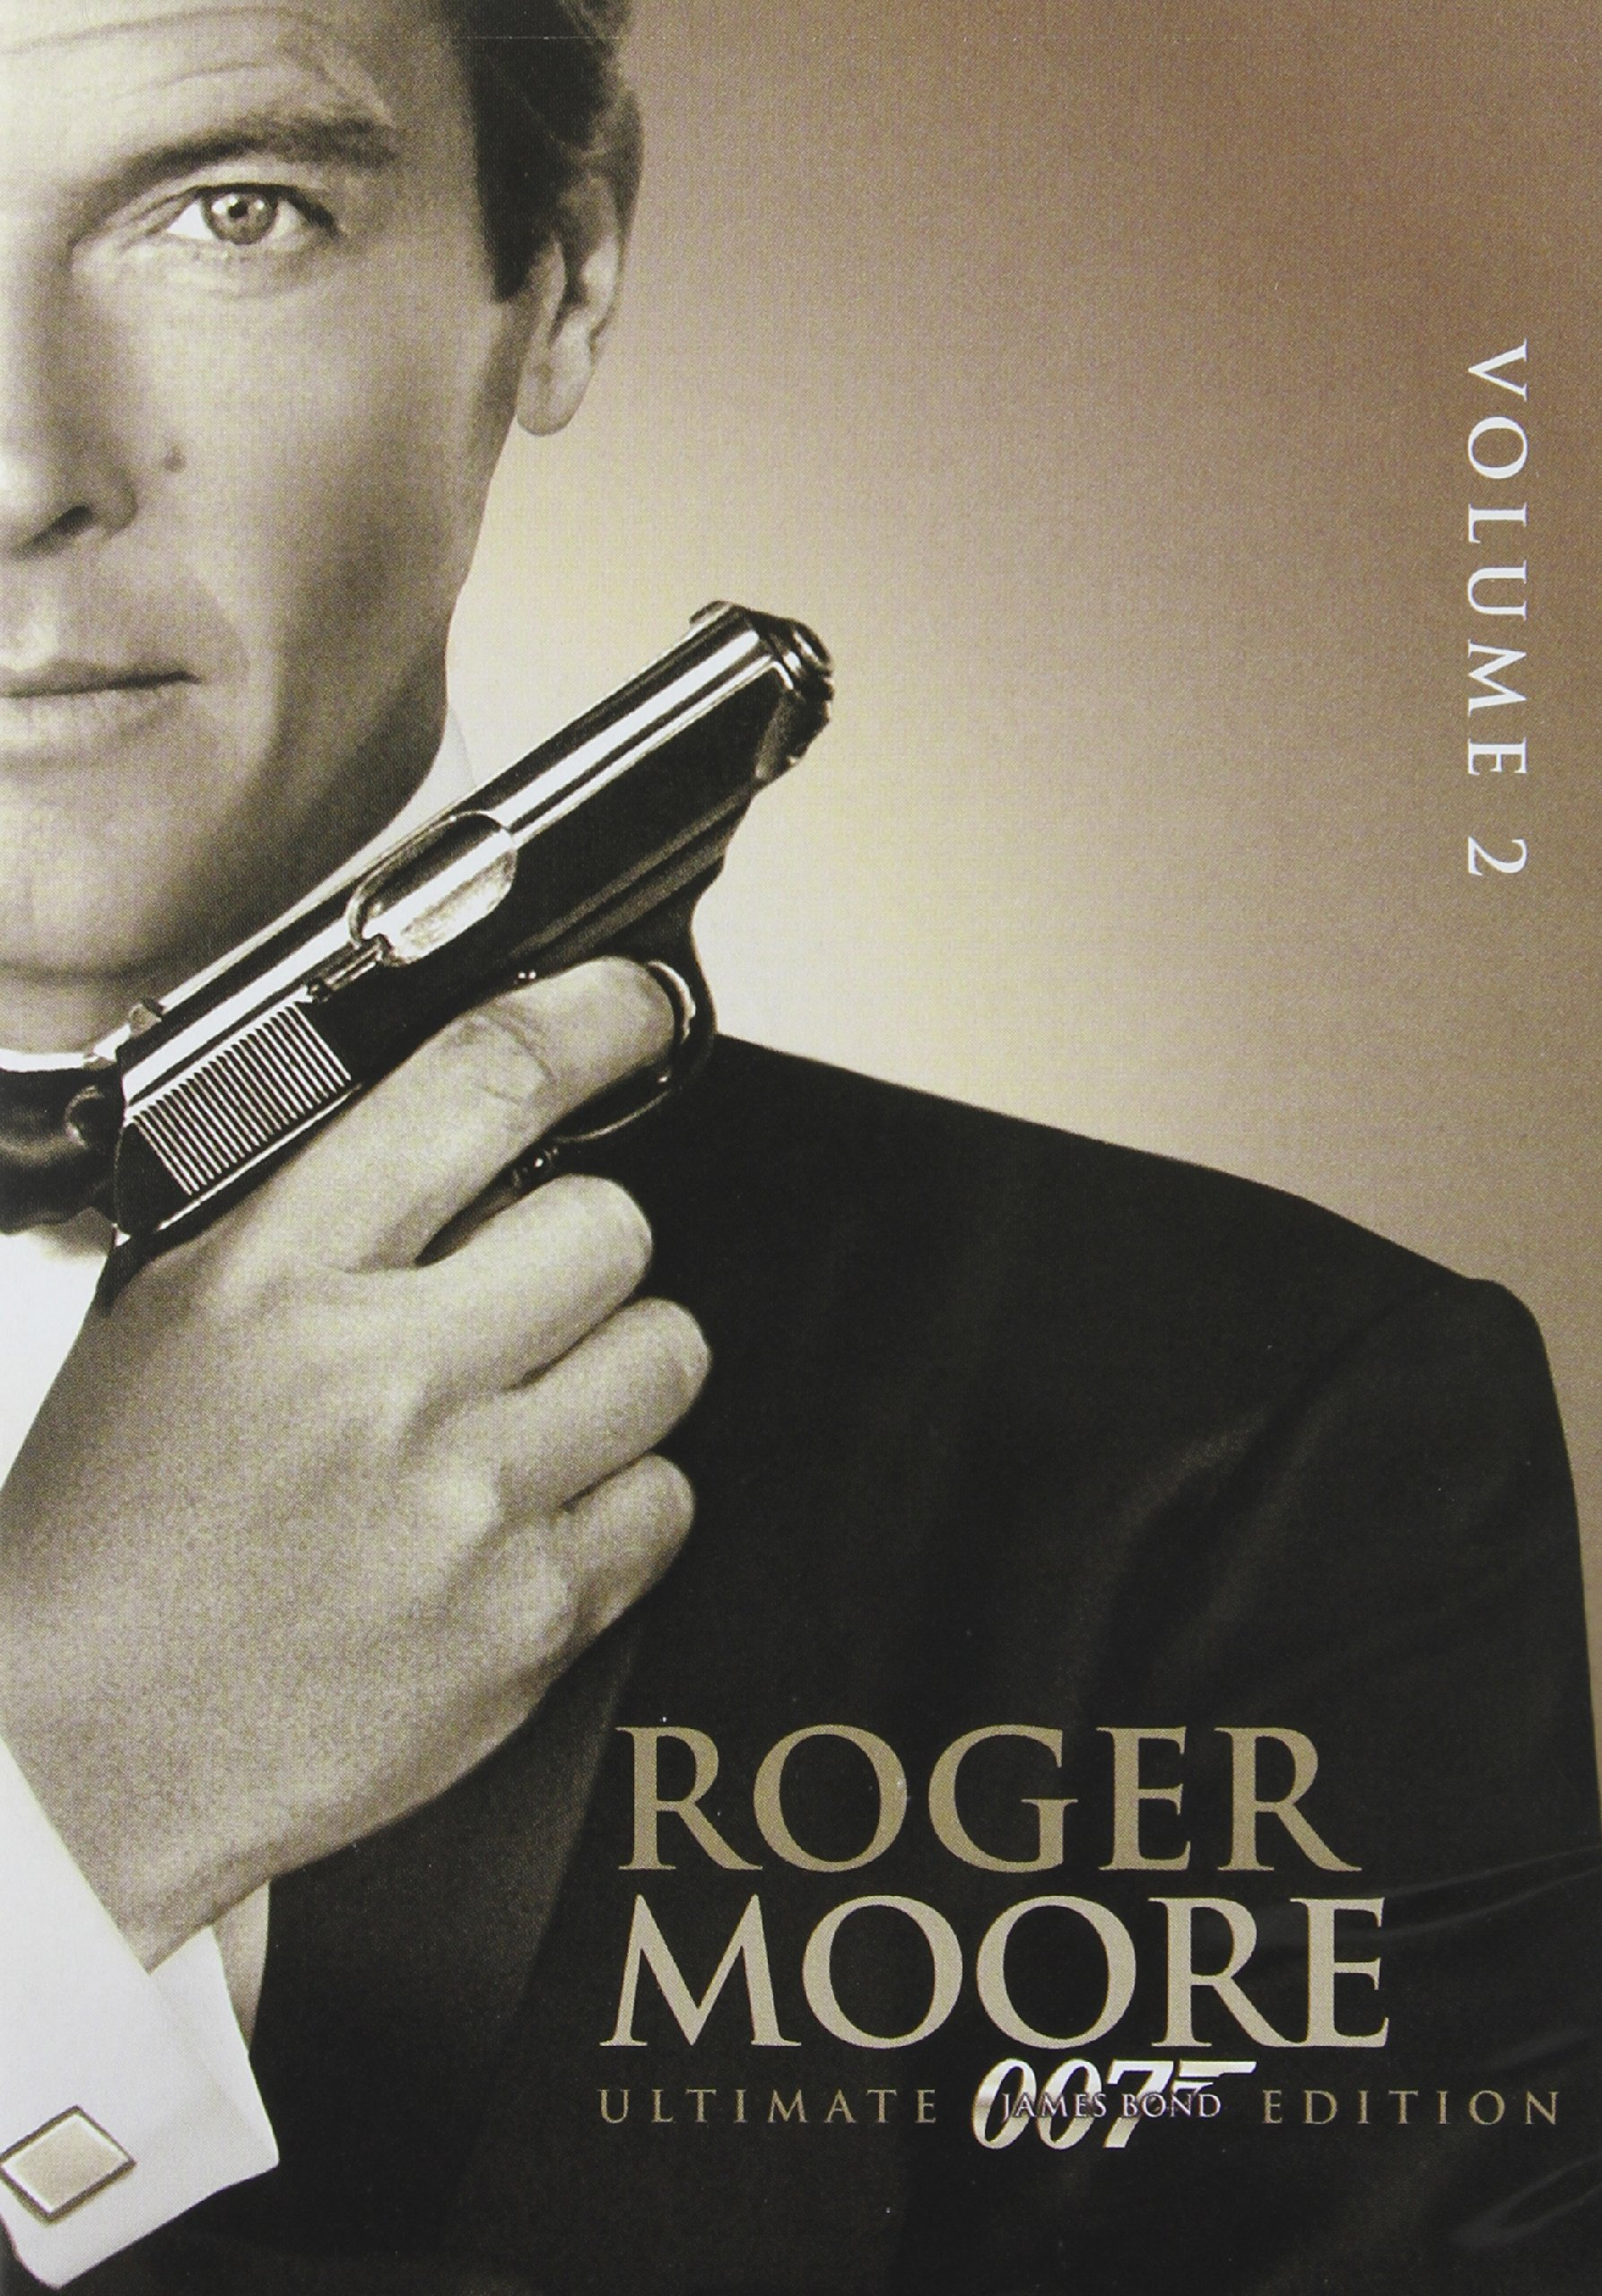 Roger Moore Ultimate 007 James Bond Edition, Vol. 2